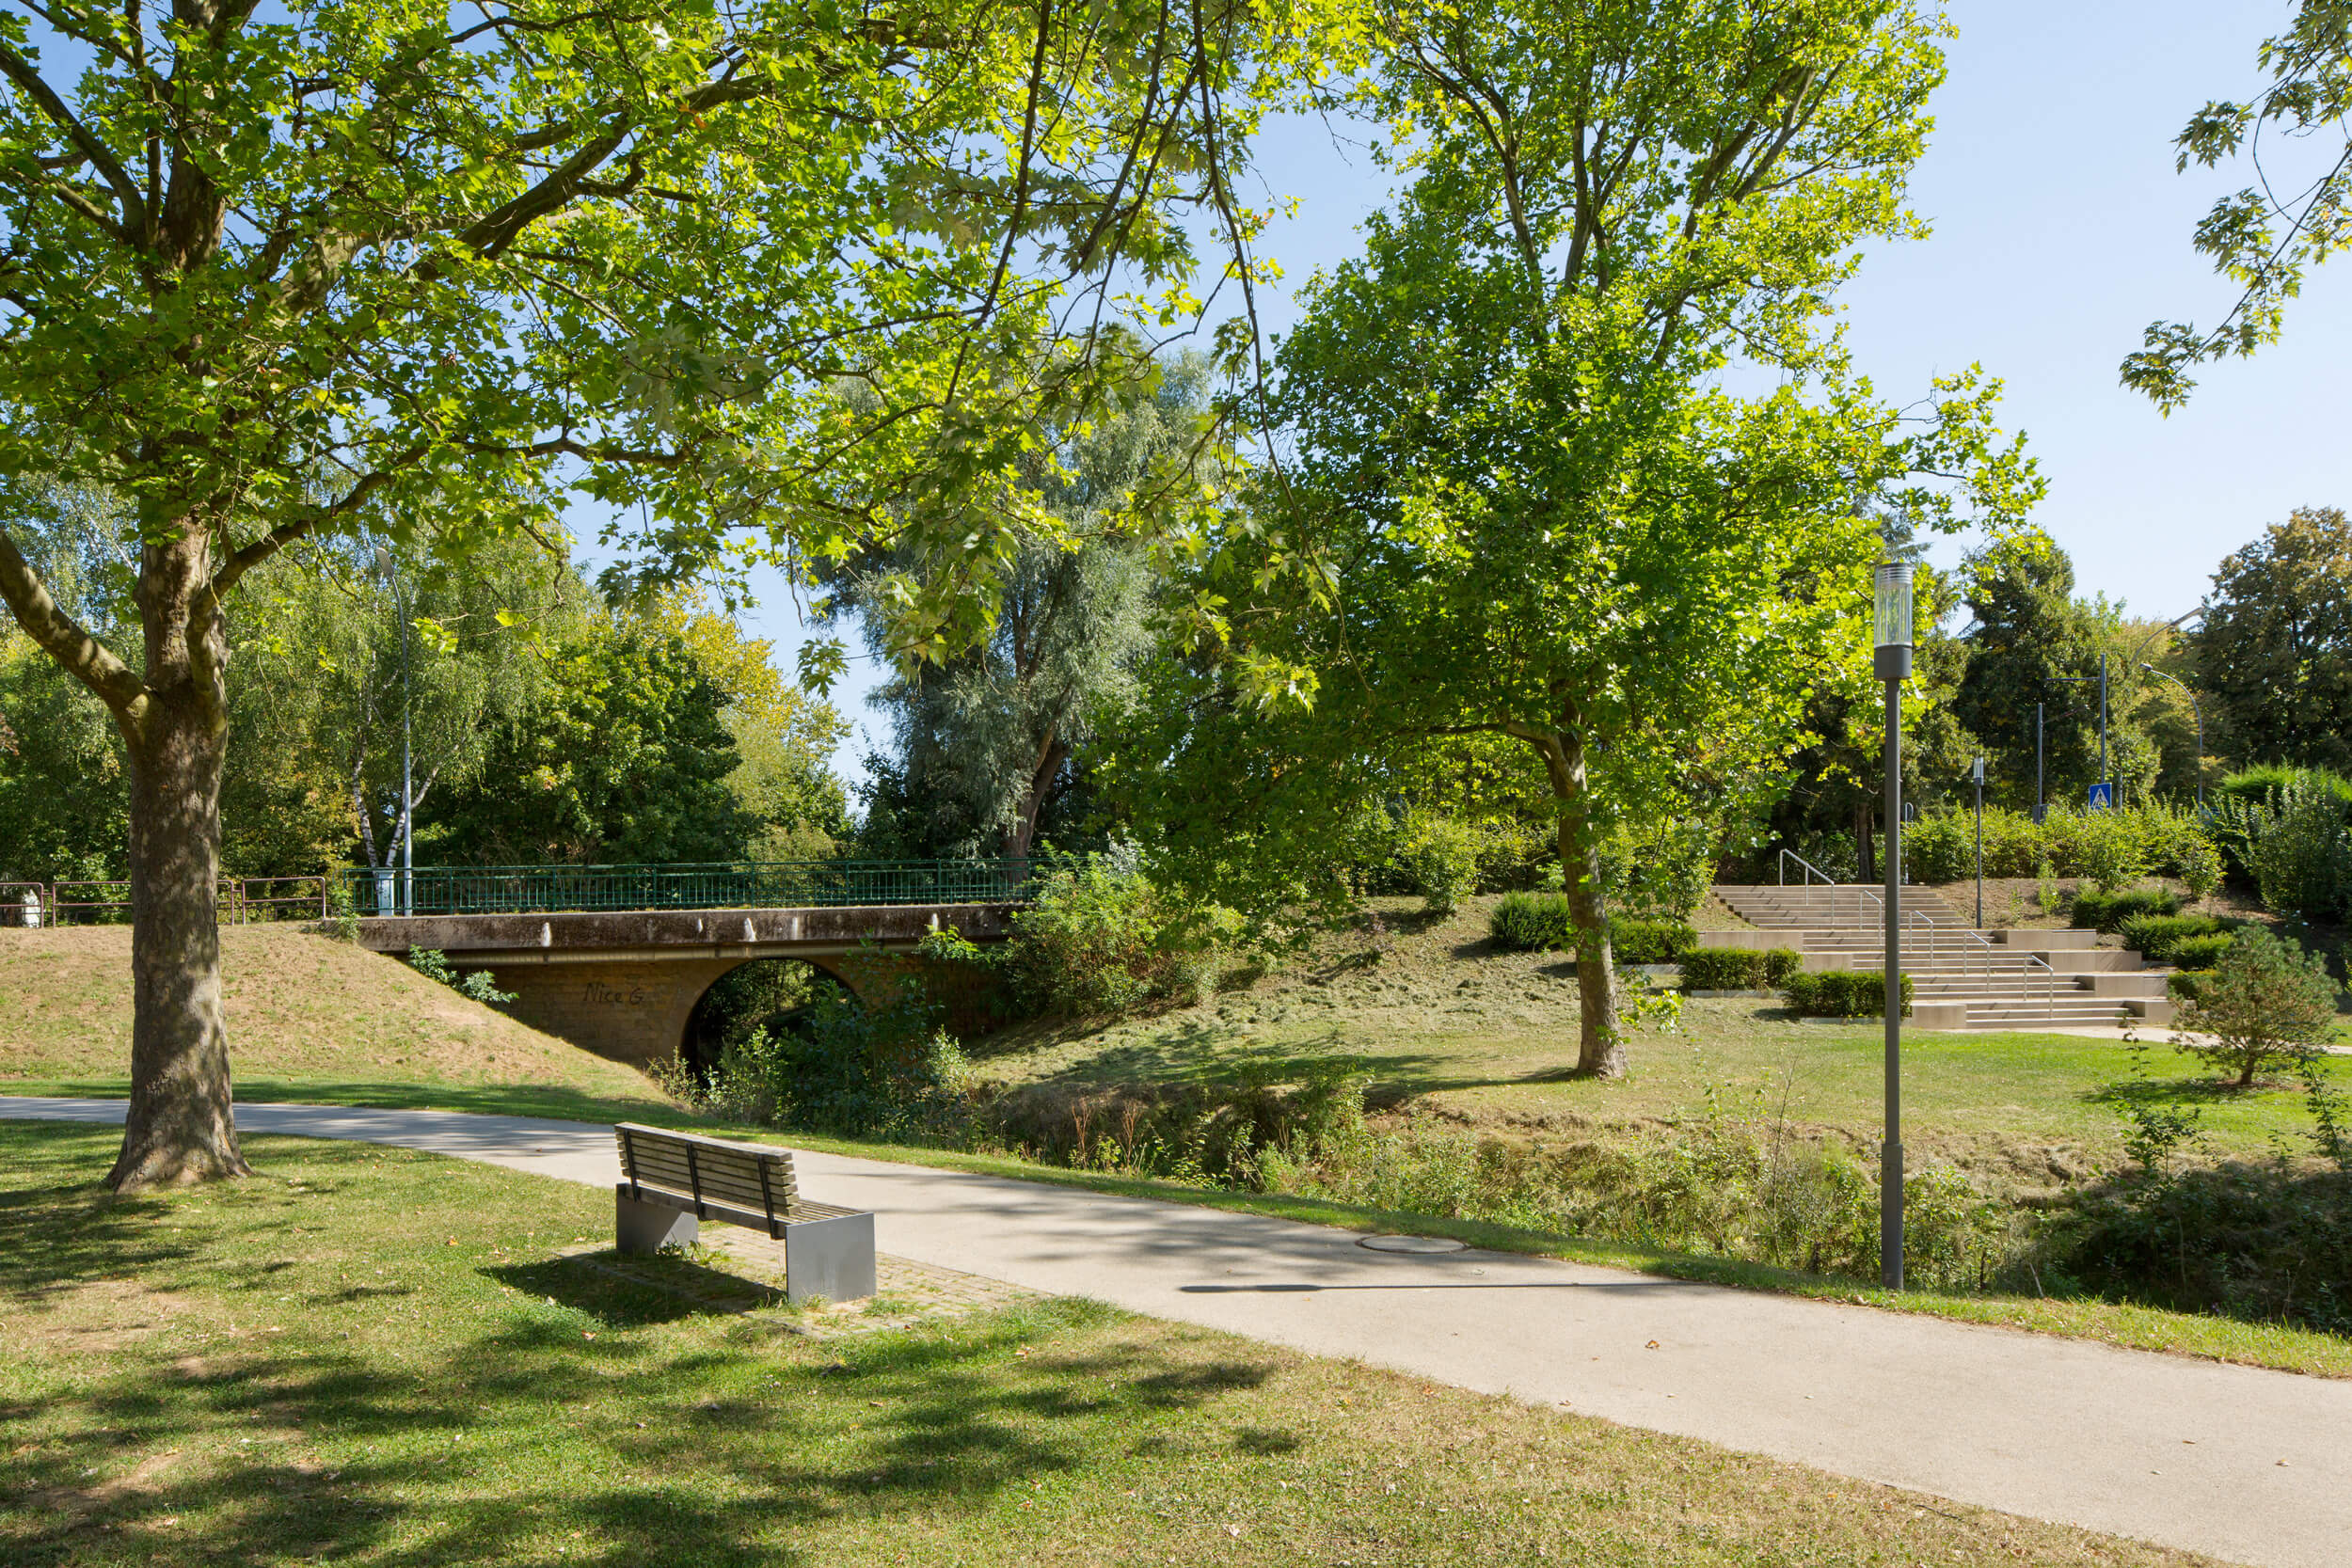 Cessinger Park